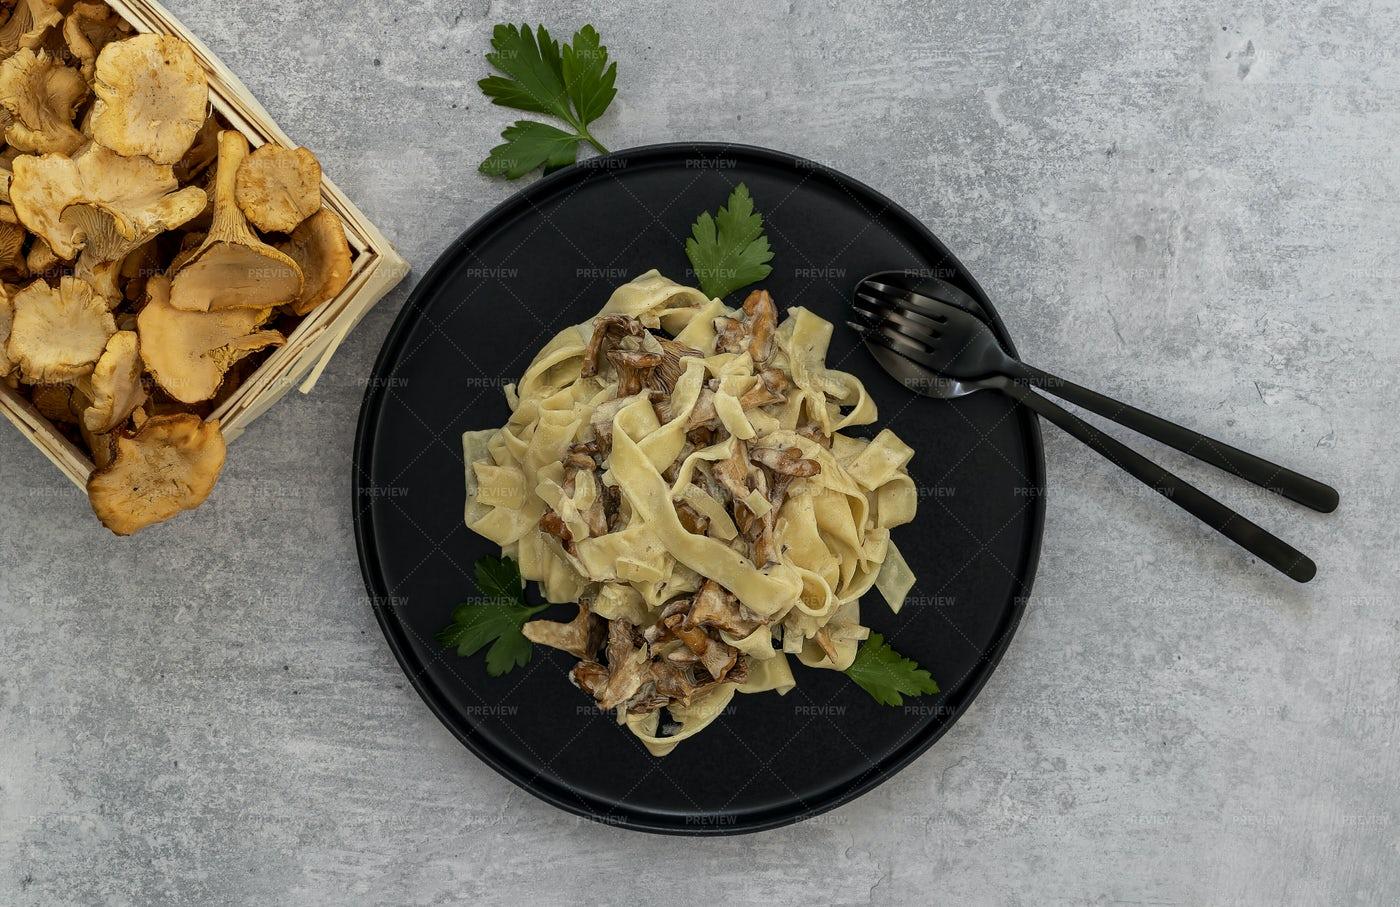 Chanterelle Mushrooms And Pasta: Stock Photos